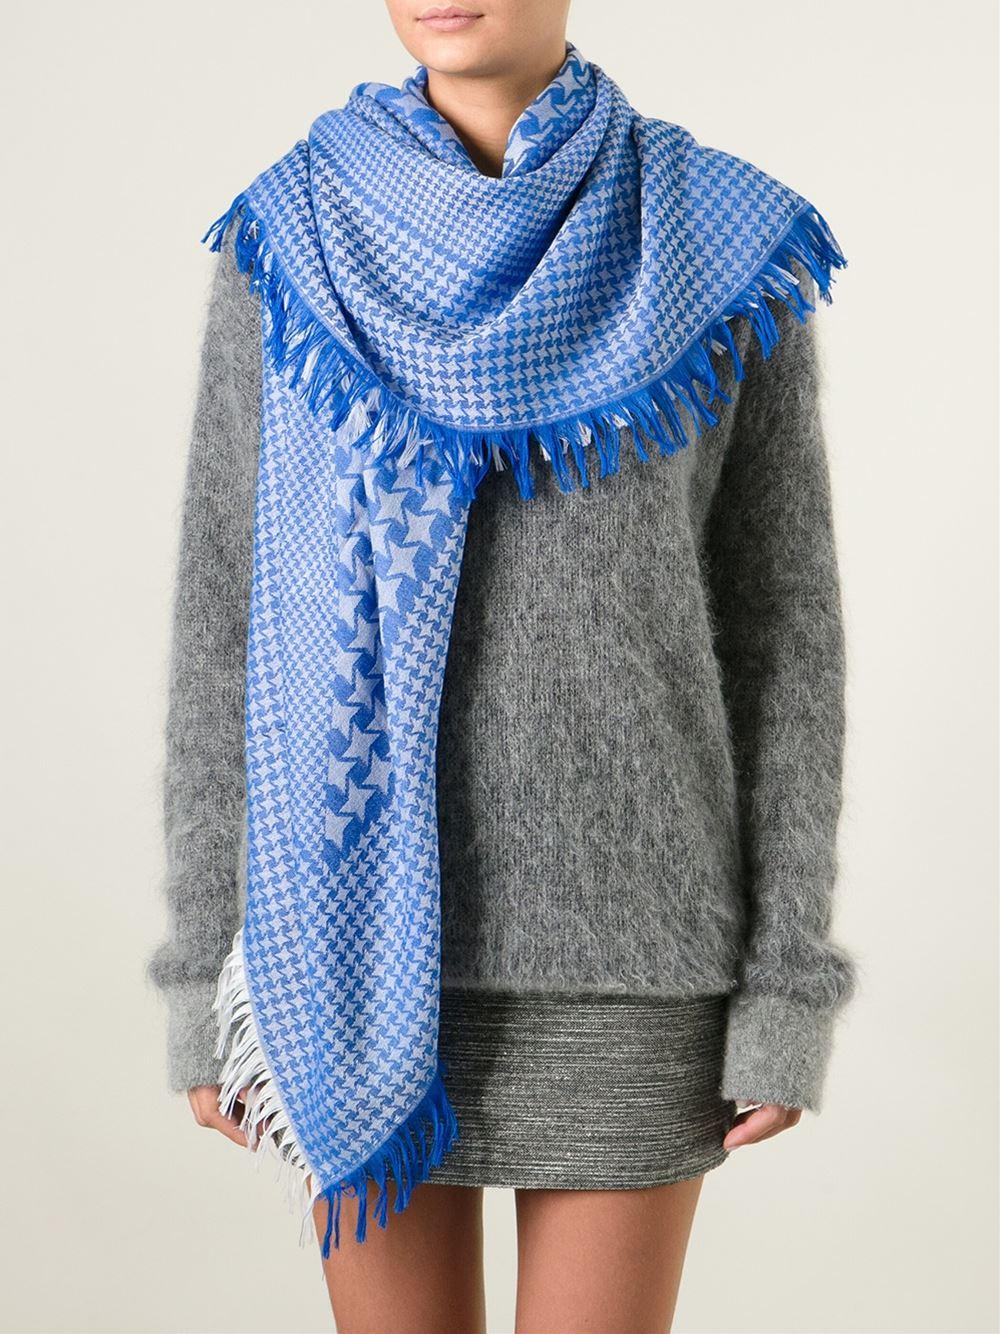 blue star clothing company scarfs - photo #12